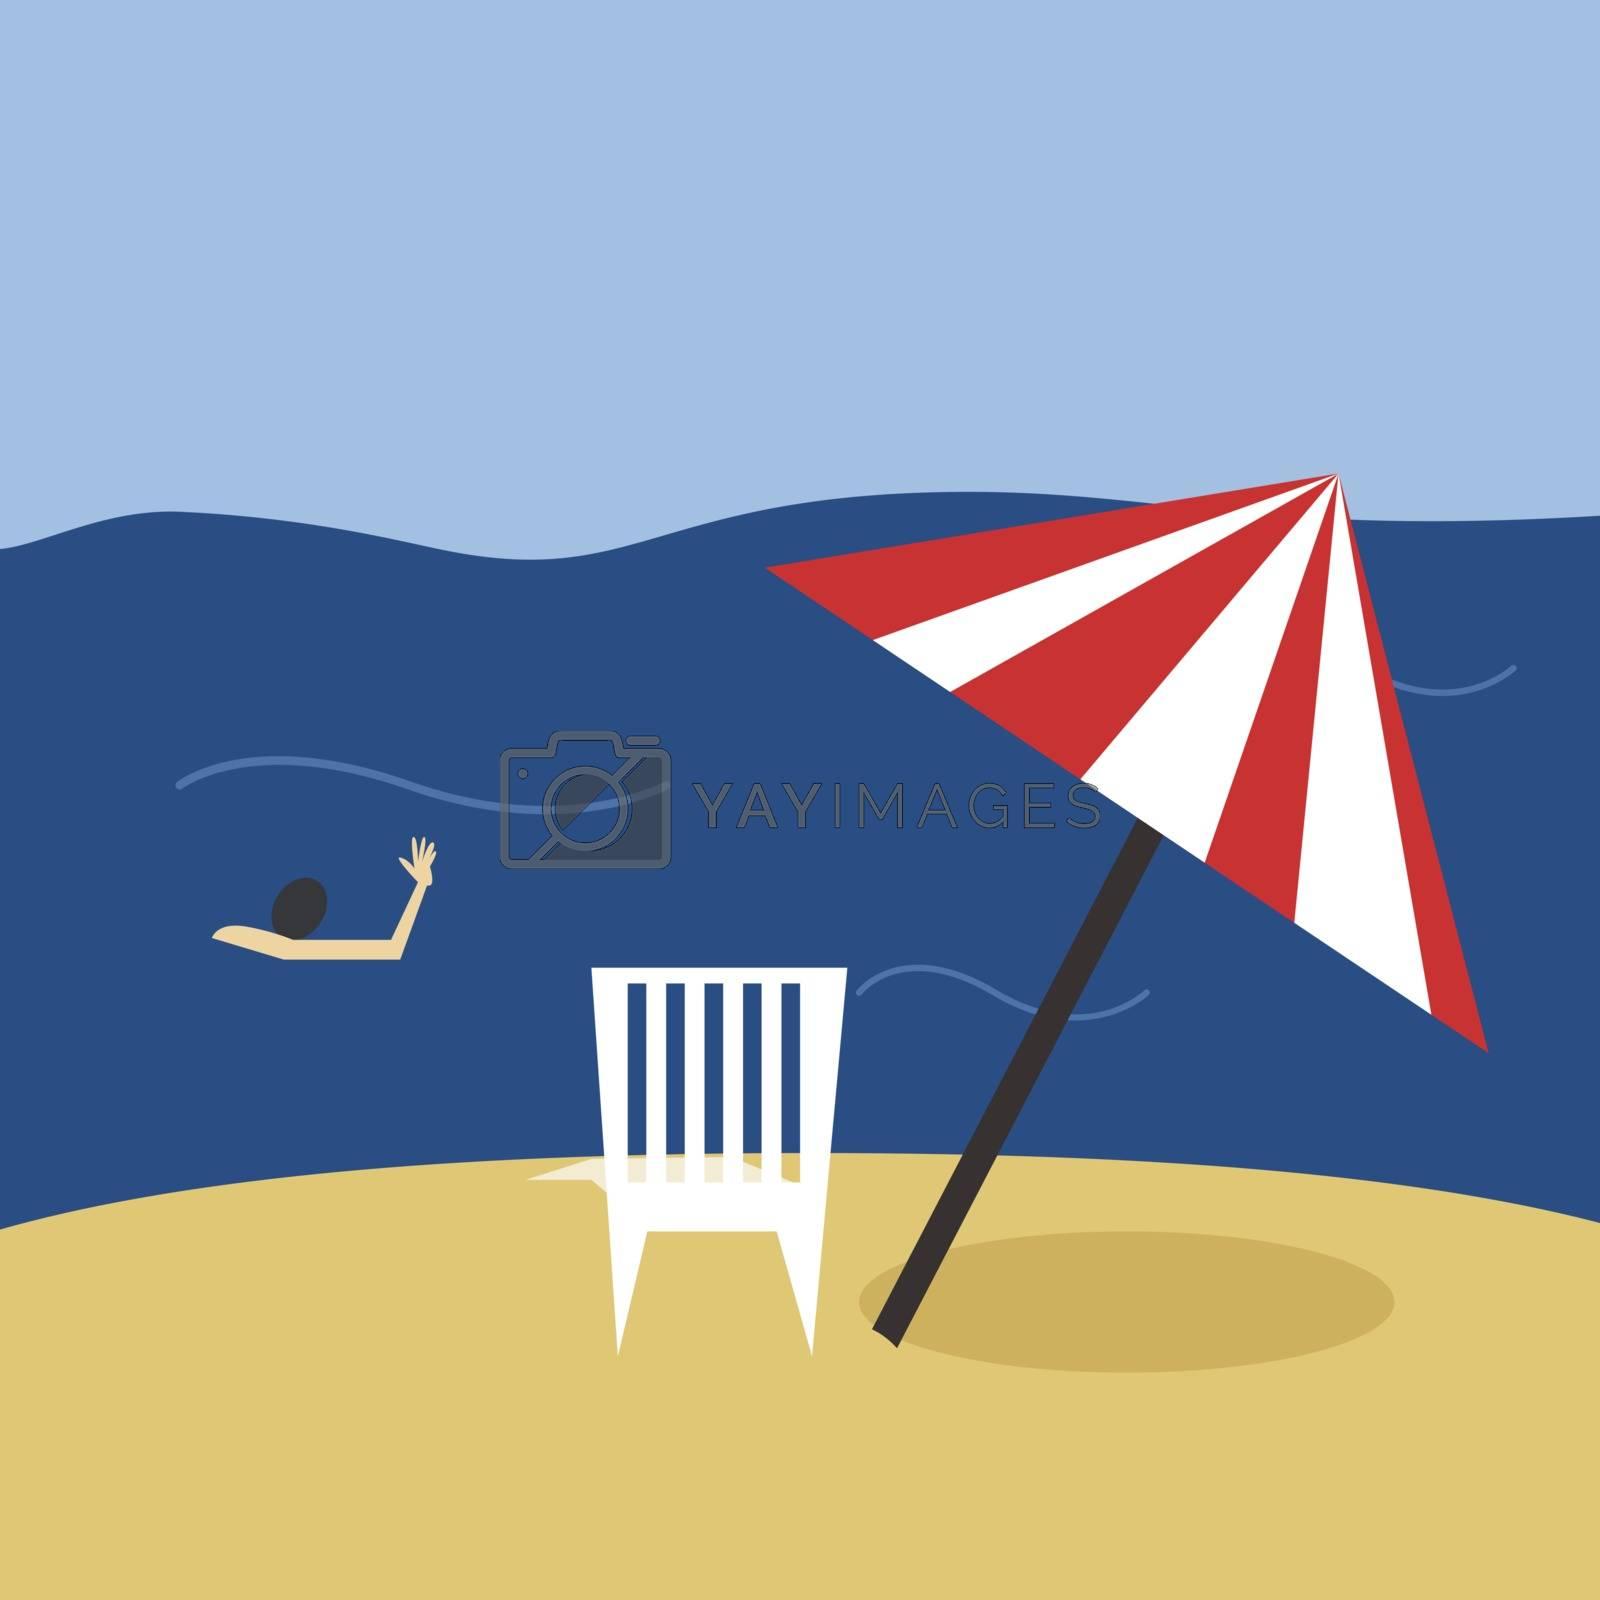 Beach, illustration, vector on white background.